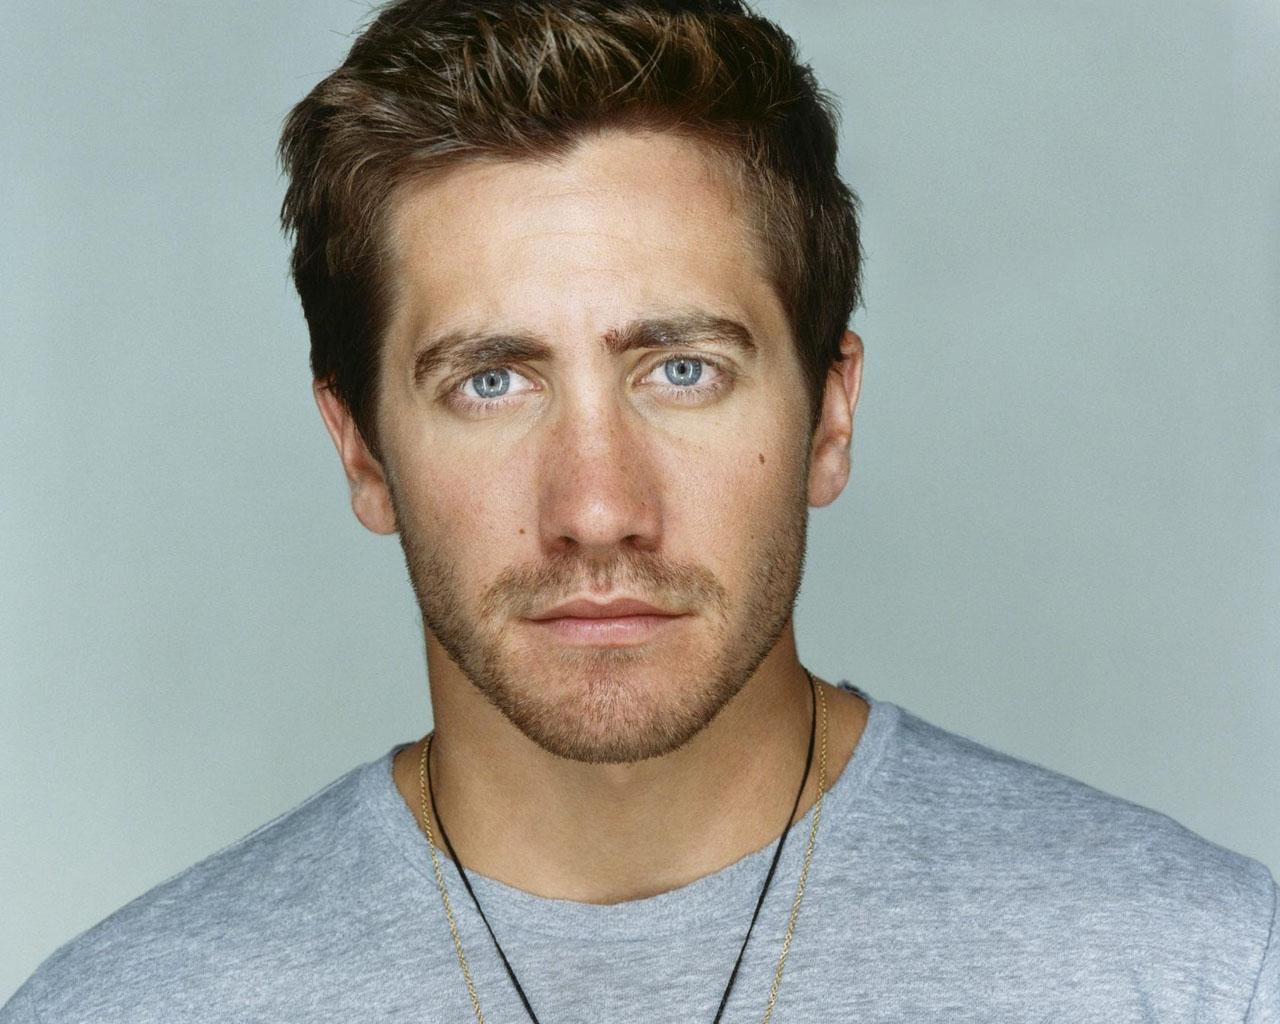 Jake Gyllenhaal Pics, Celebrity Collection